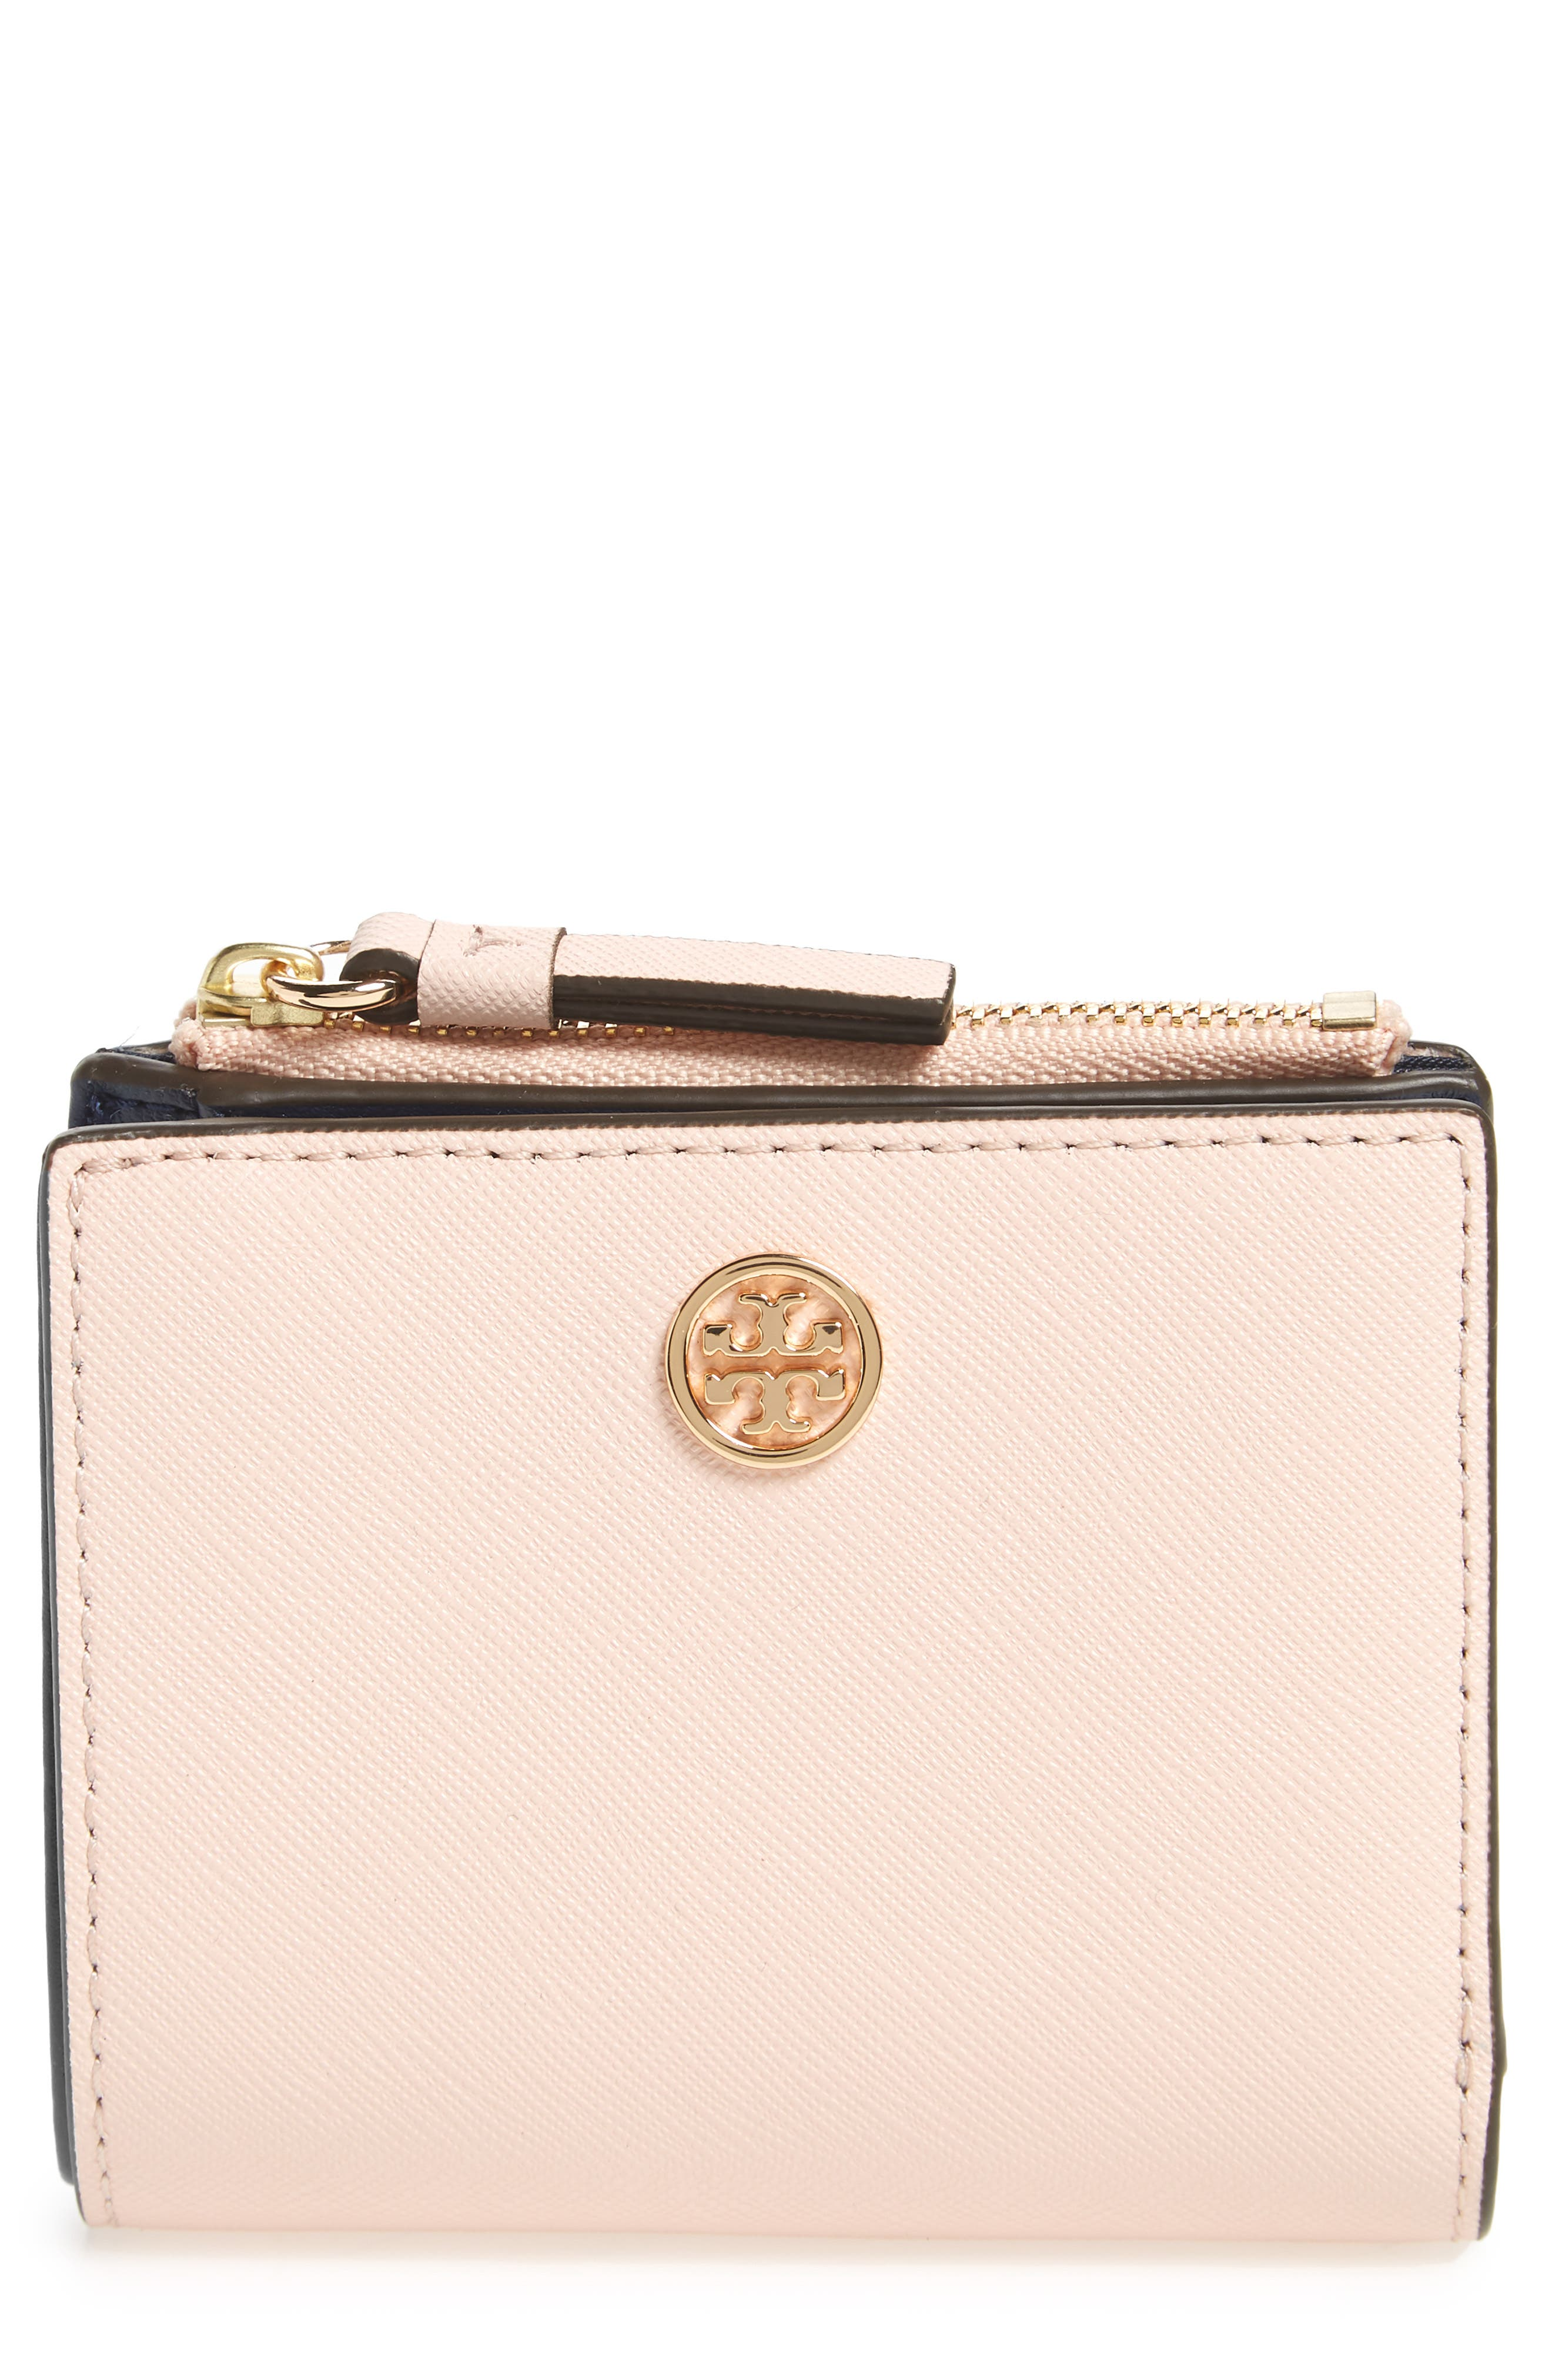 Mini Robinson Wallet Leather Bifold Wallet,                             Main thumbnail 1, color,                             Pale Apricot / Royal Navy